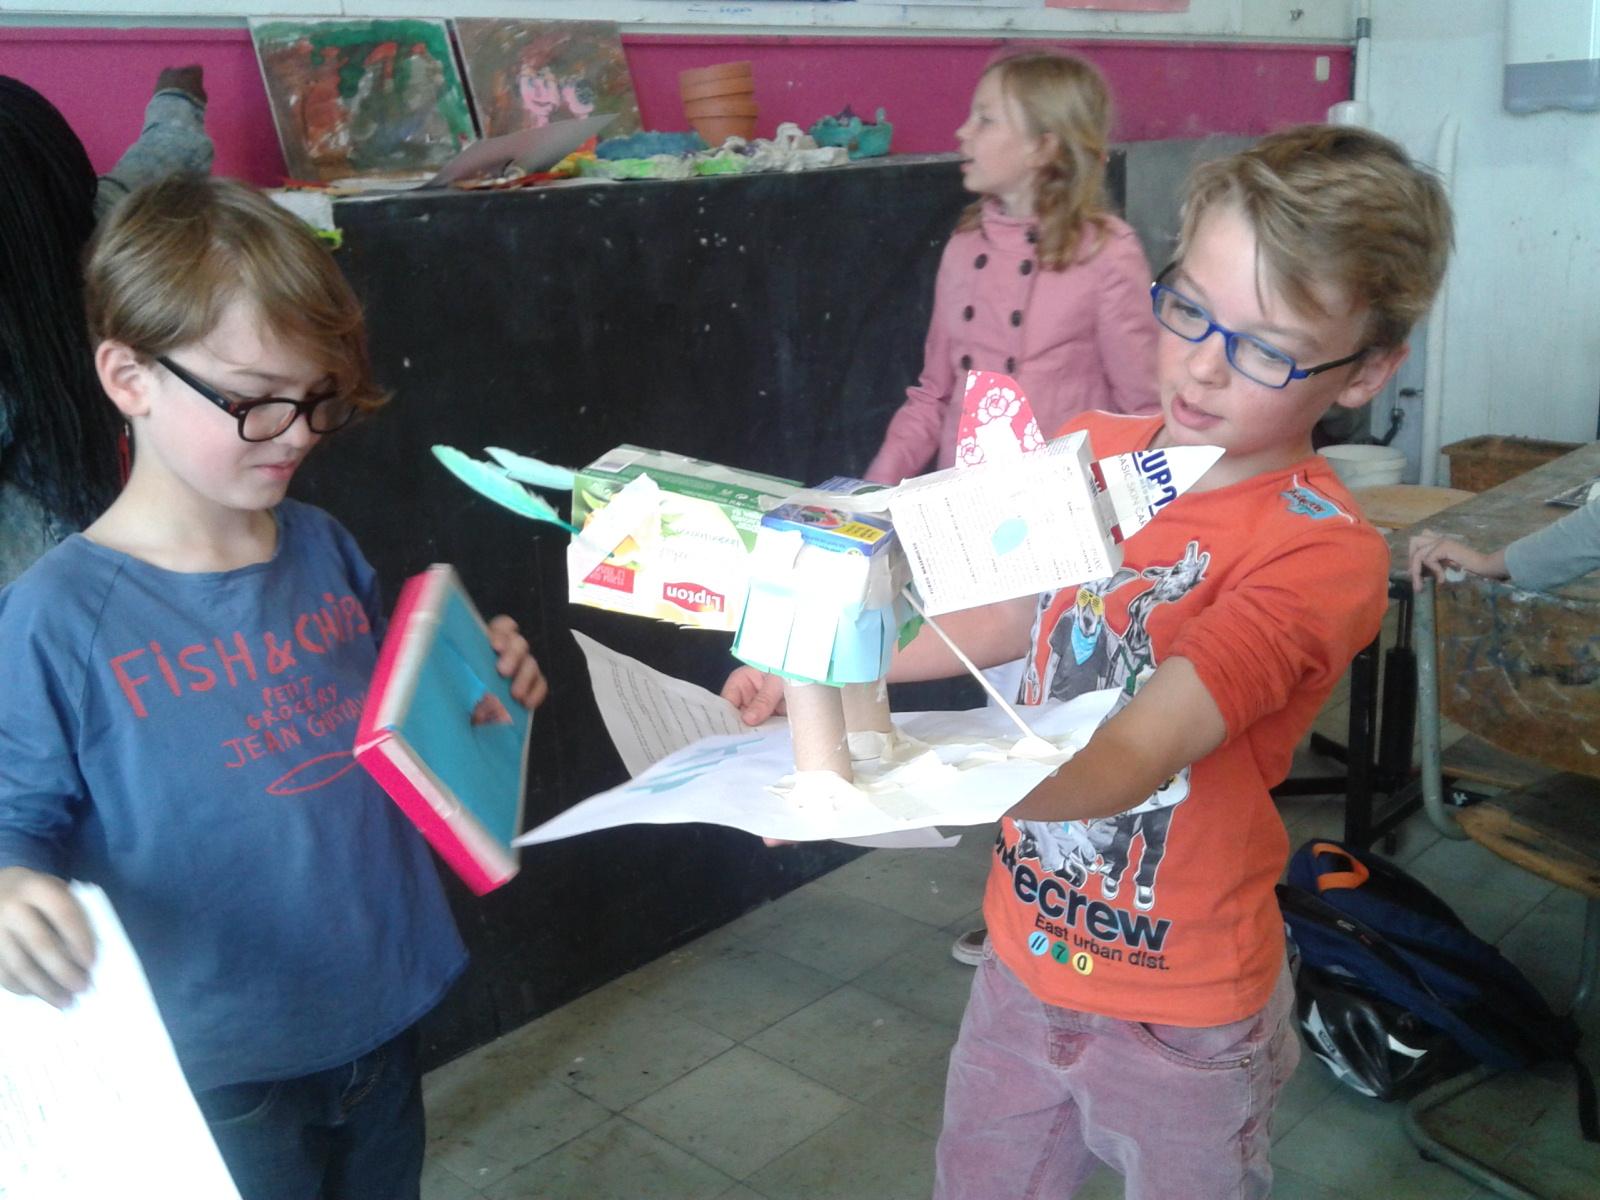 Academie Mechelen Traject drama beeld